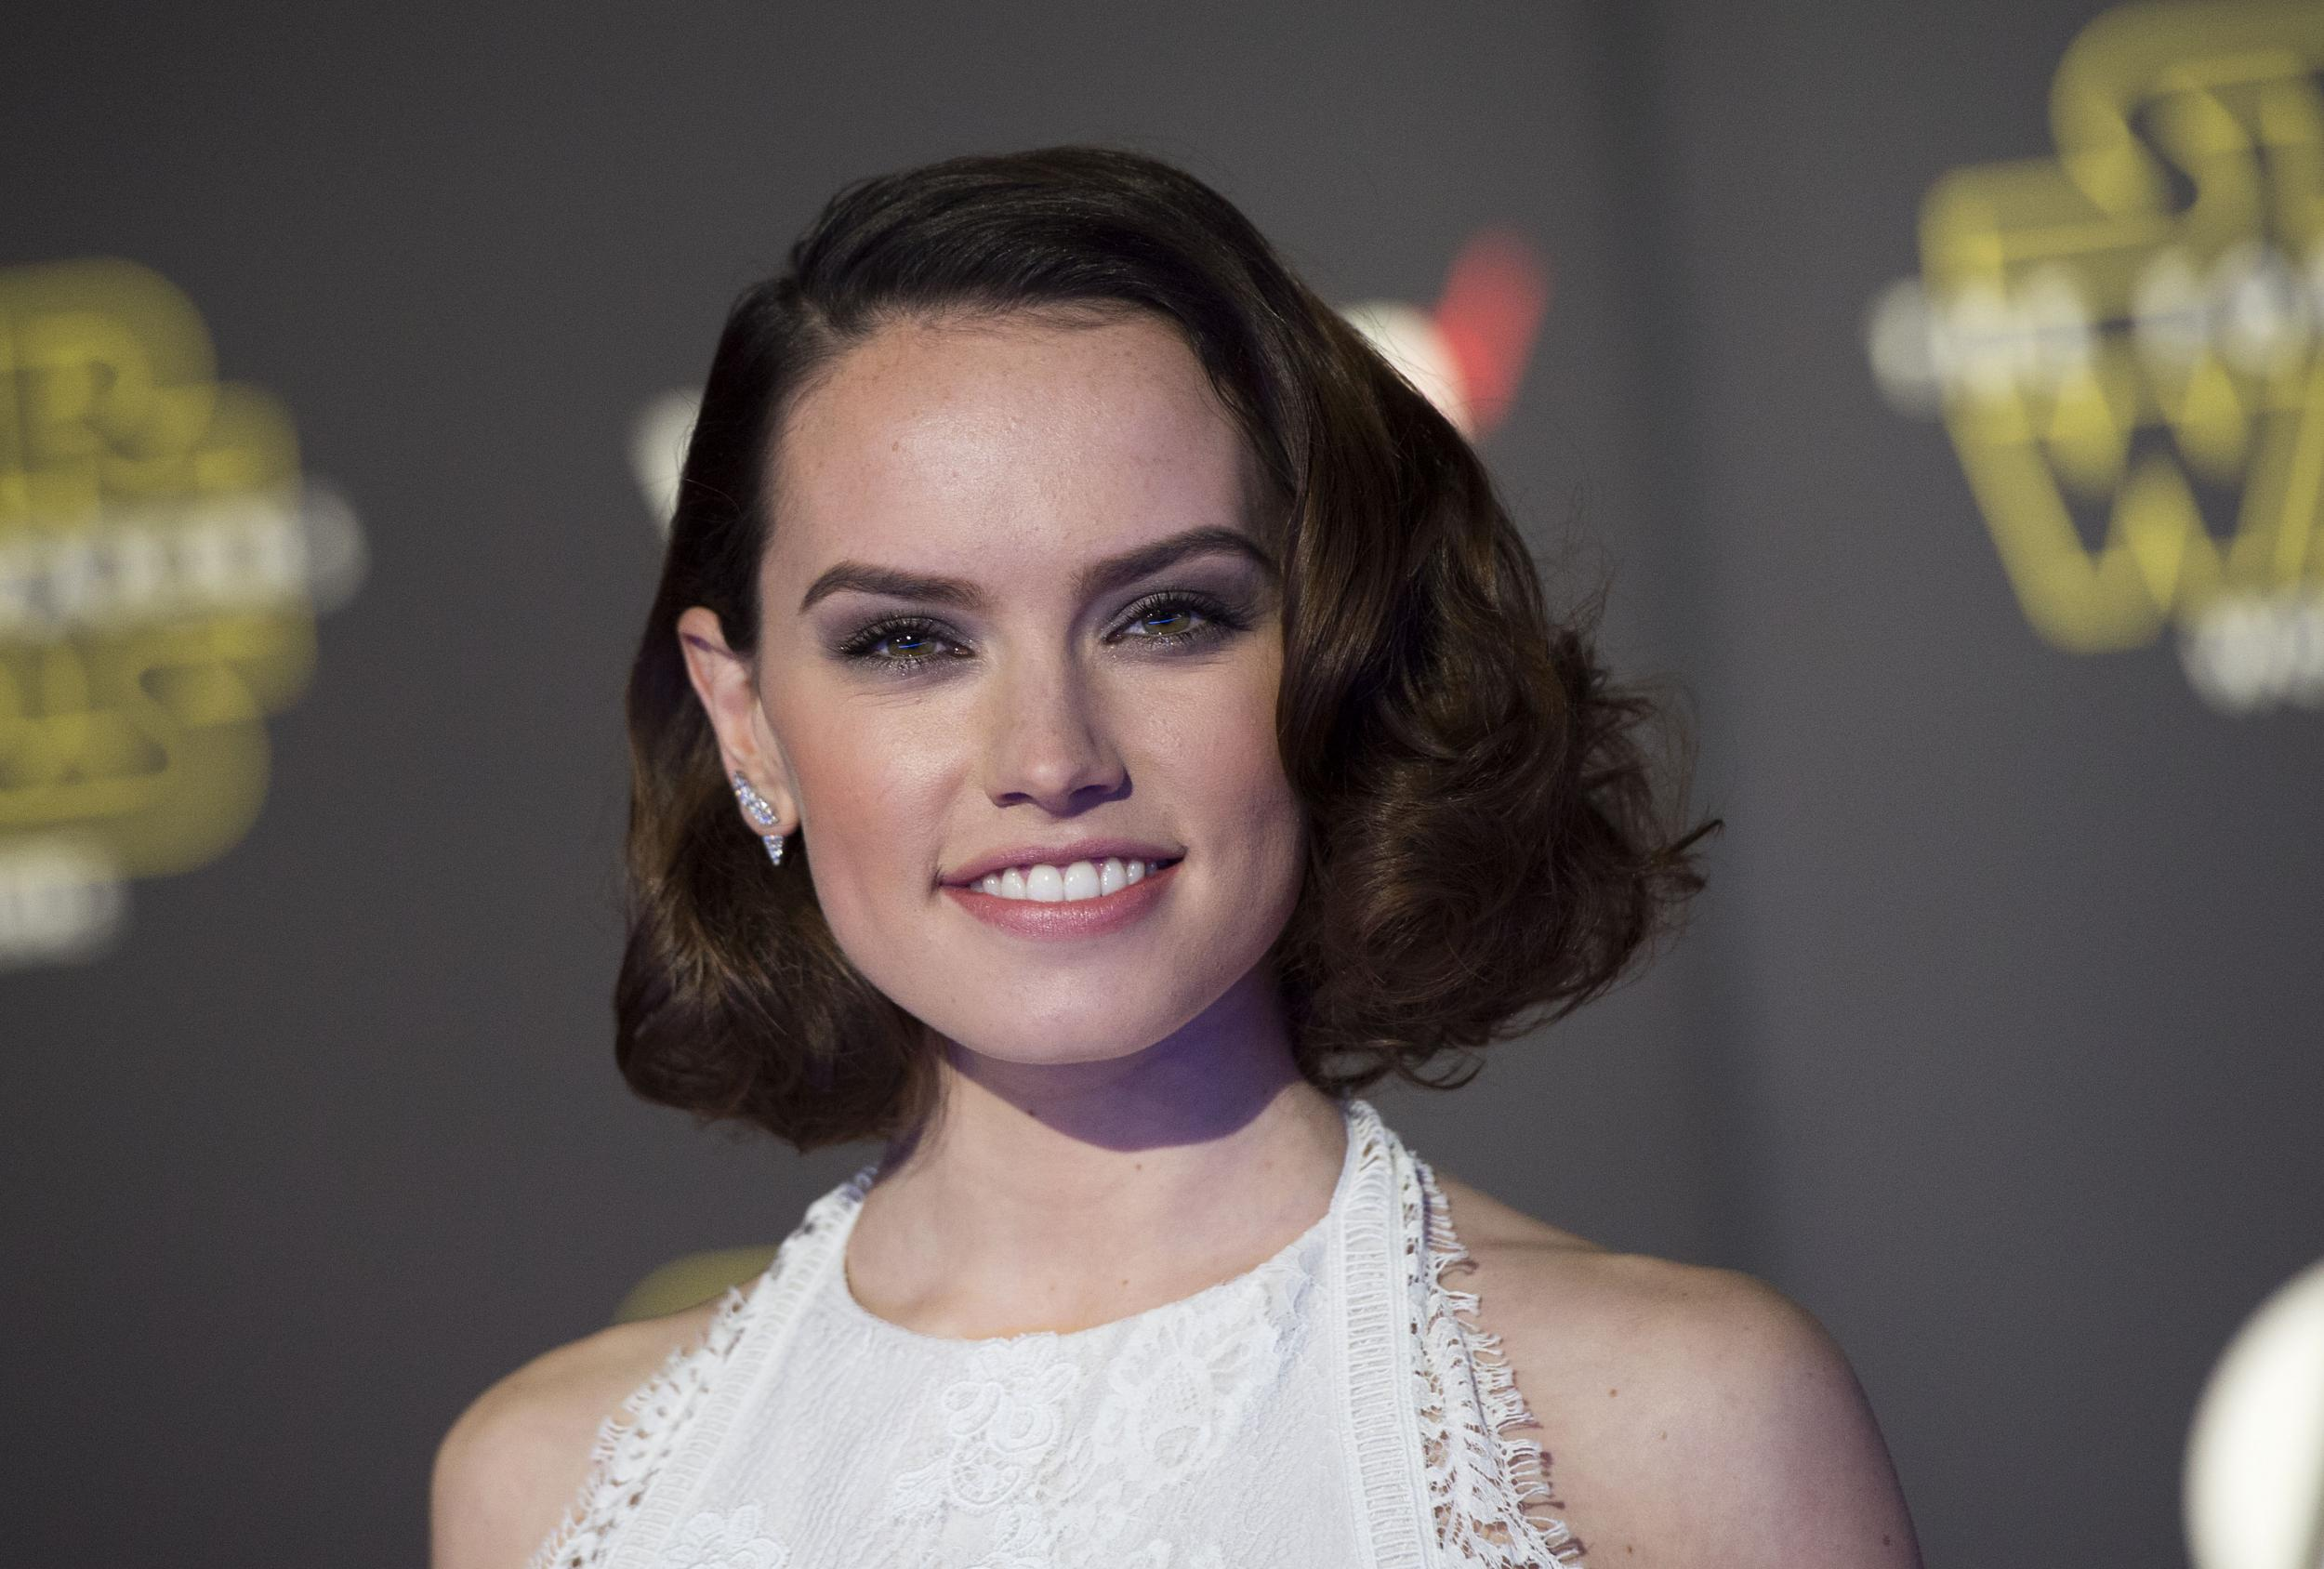 Daisy Ridley confirma conversas para interpretar Lara Croft